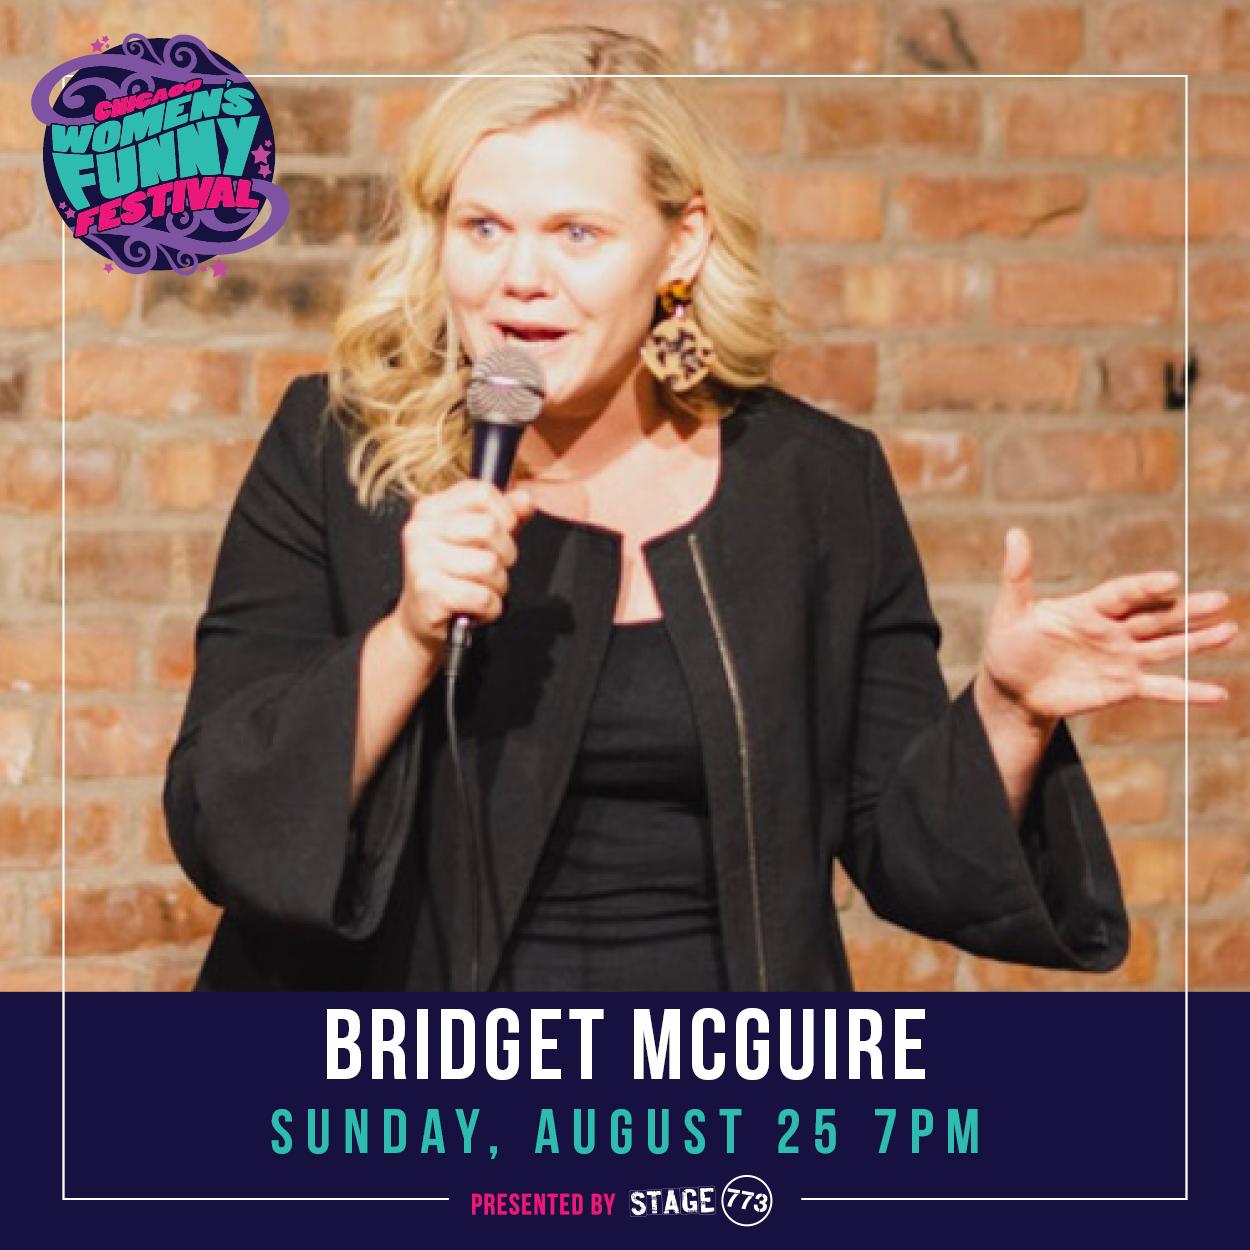 BridgetMcGuire_Sunday_7PM_CWFF2019.jpg